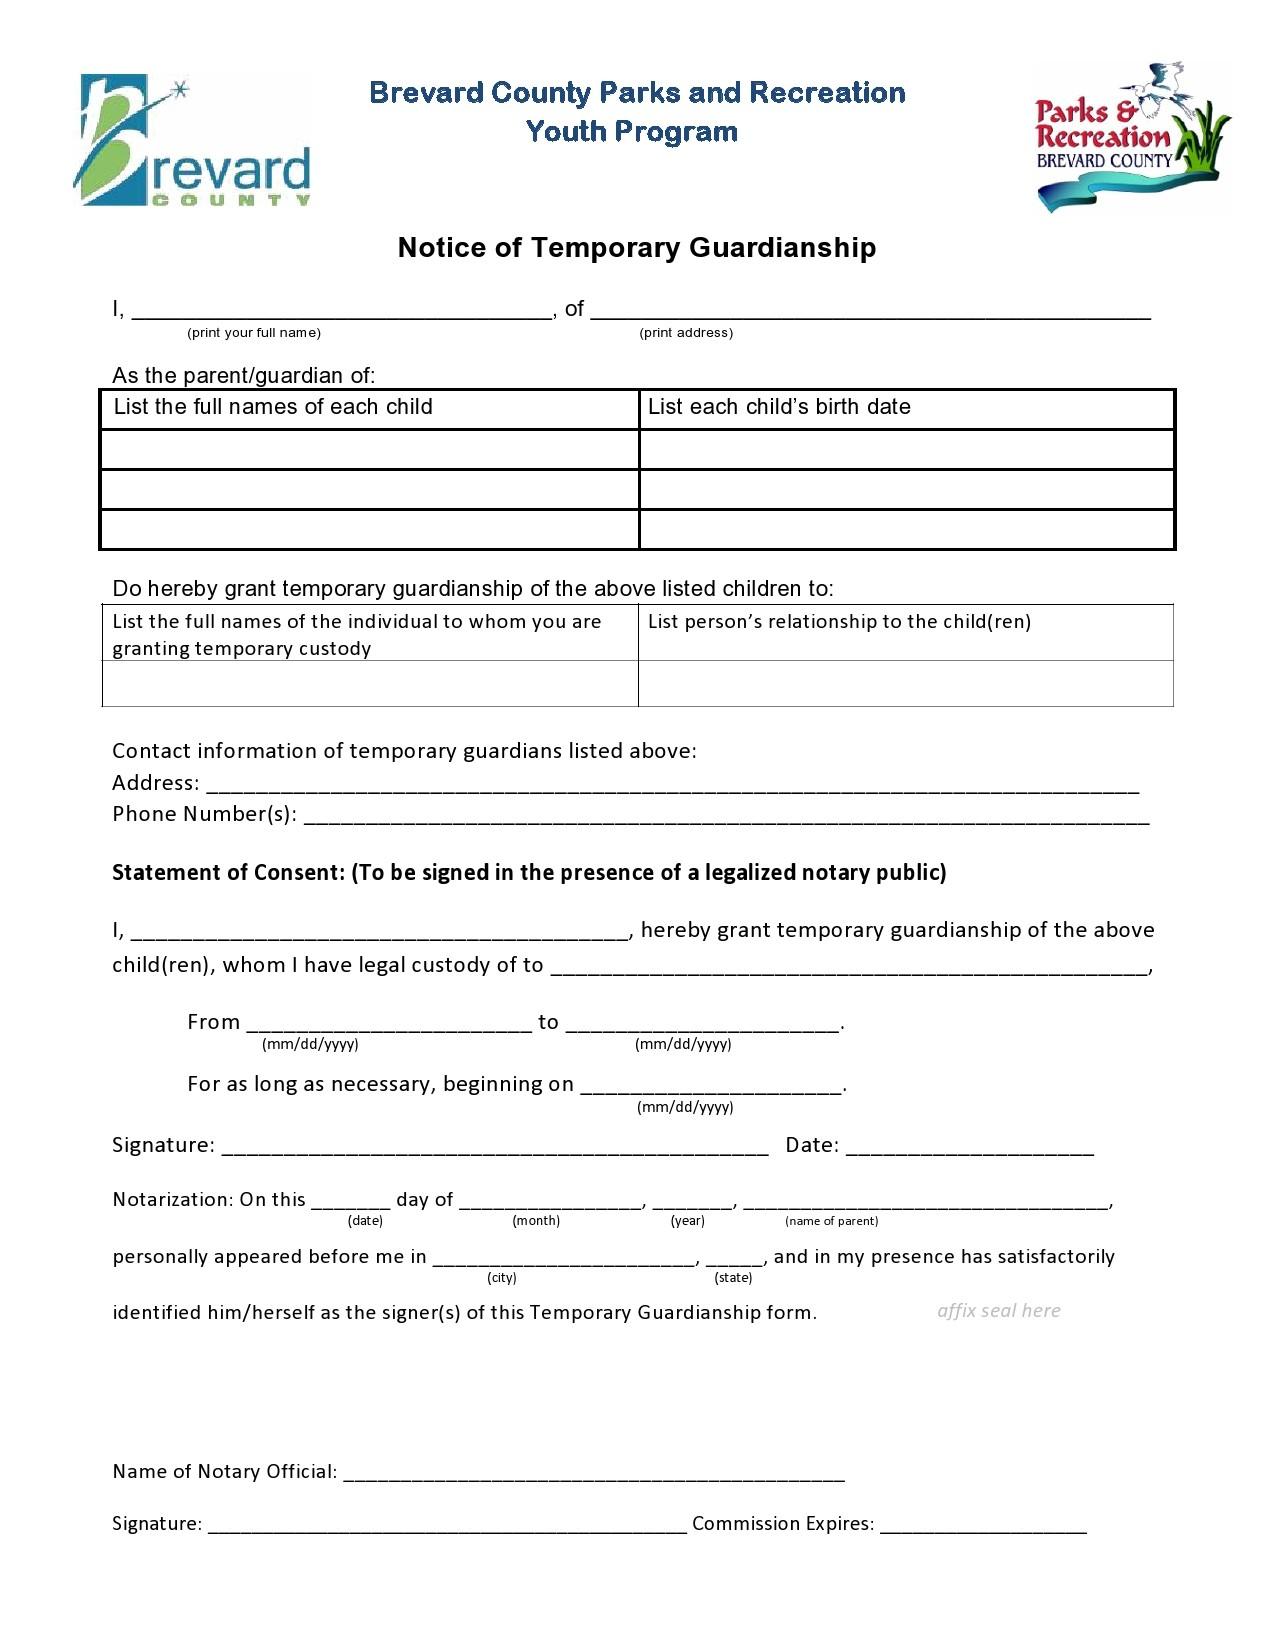 Free guardianship form 22